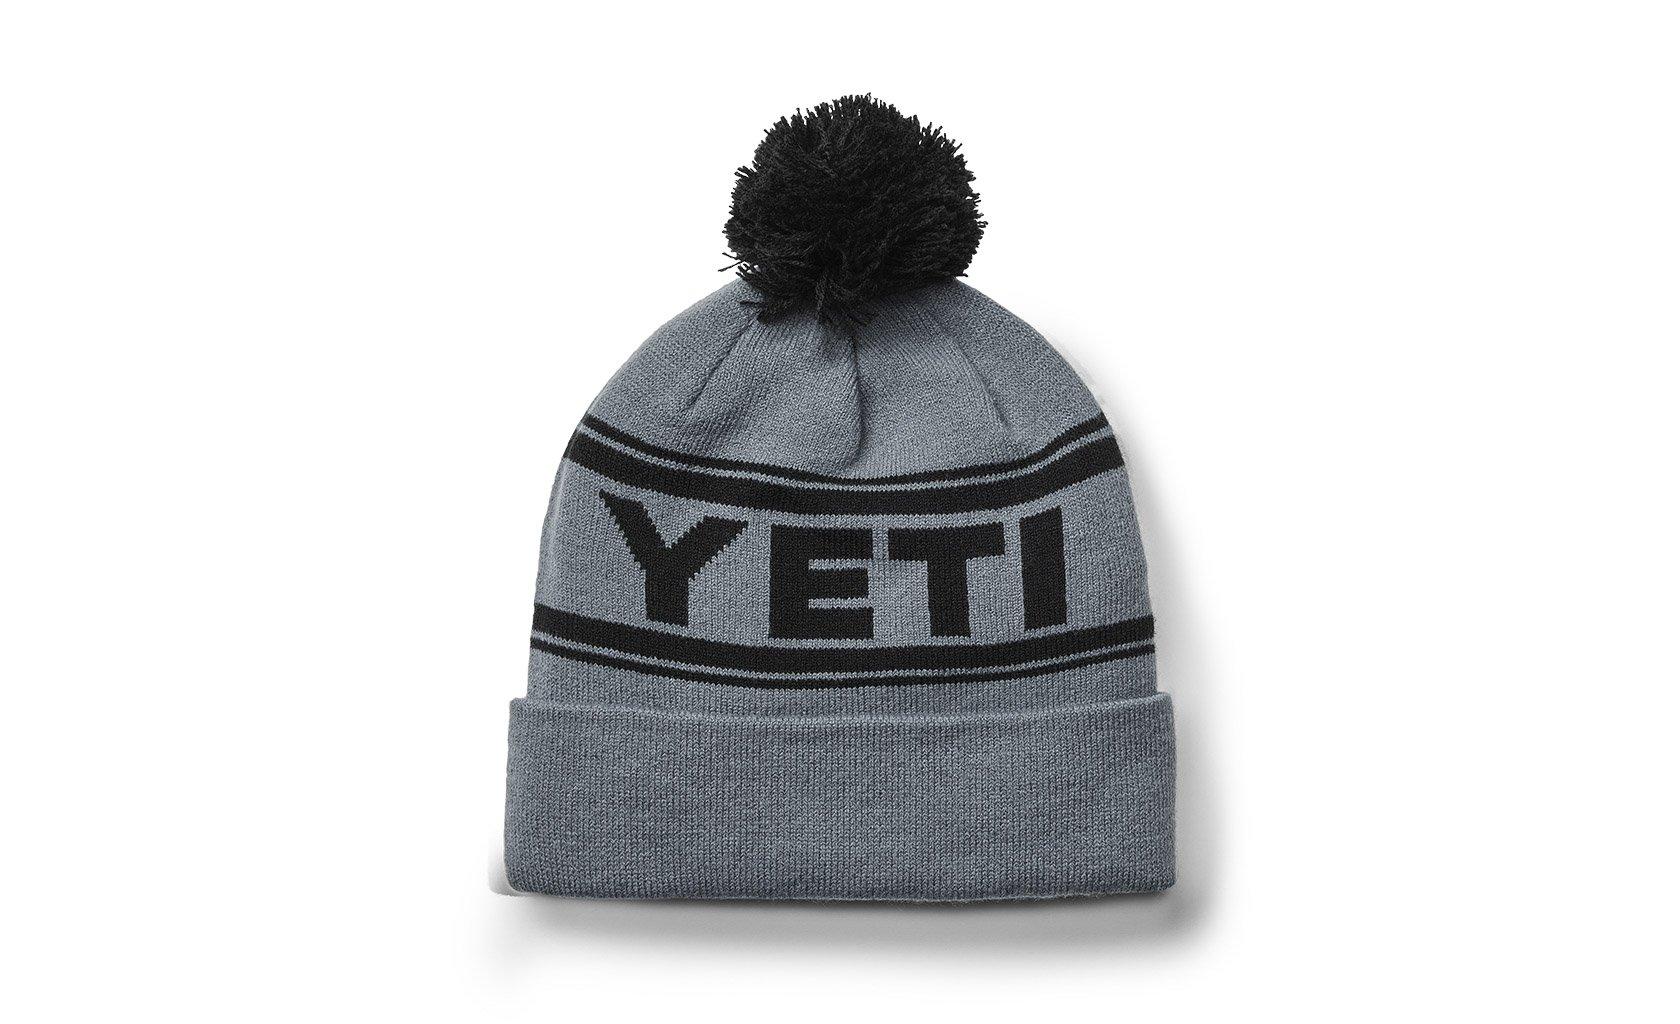 210173-Fall-Apparel-F21-Hats-Retro-Knit-Beanie-Gray-Black-F-1680x1024-1629423629440